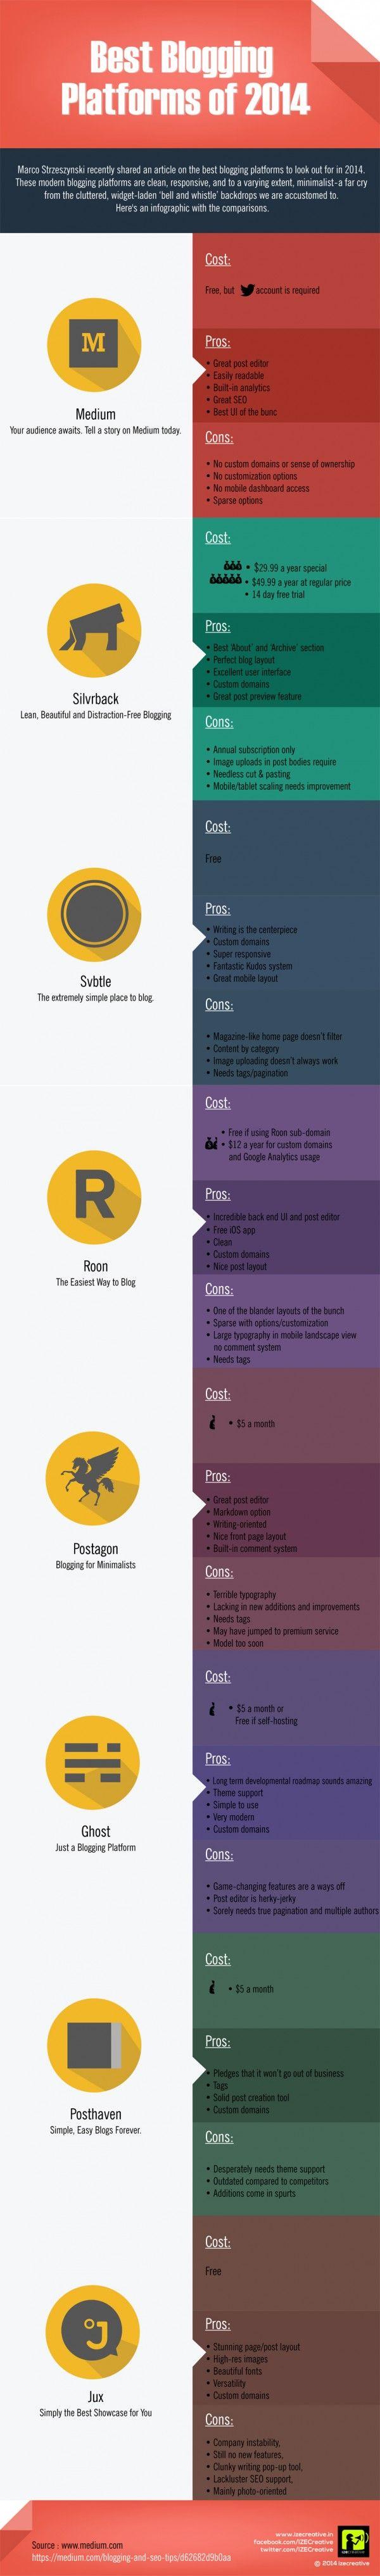 Best Blogging Platforms of 2014 [Infographic]